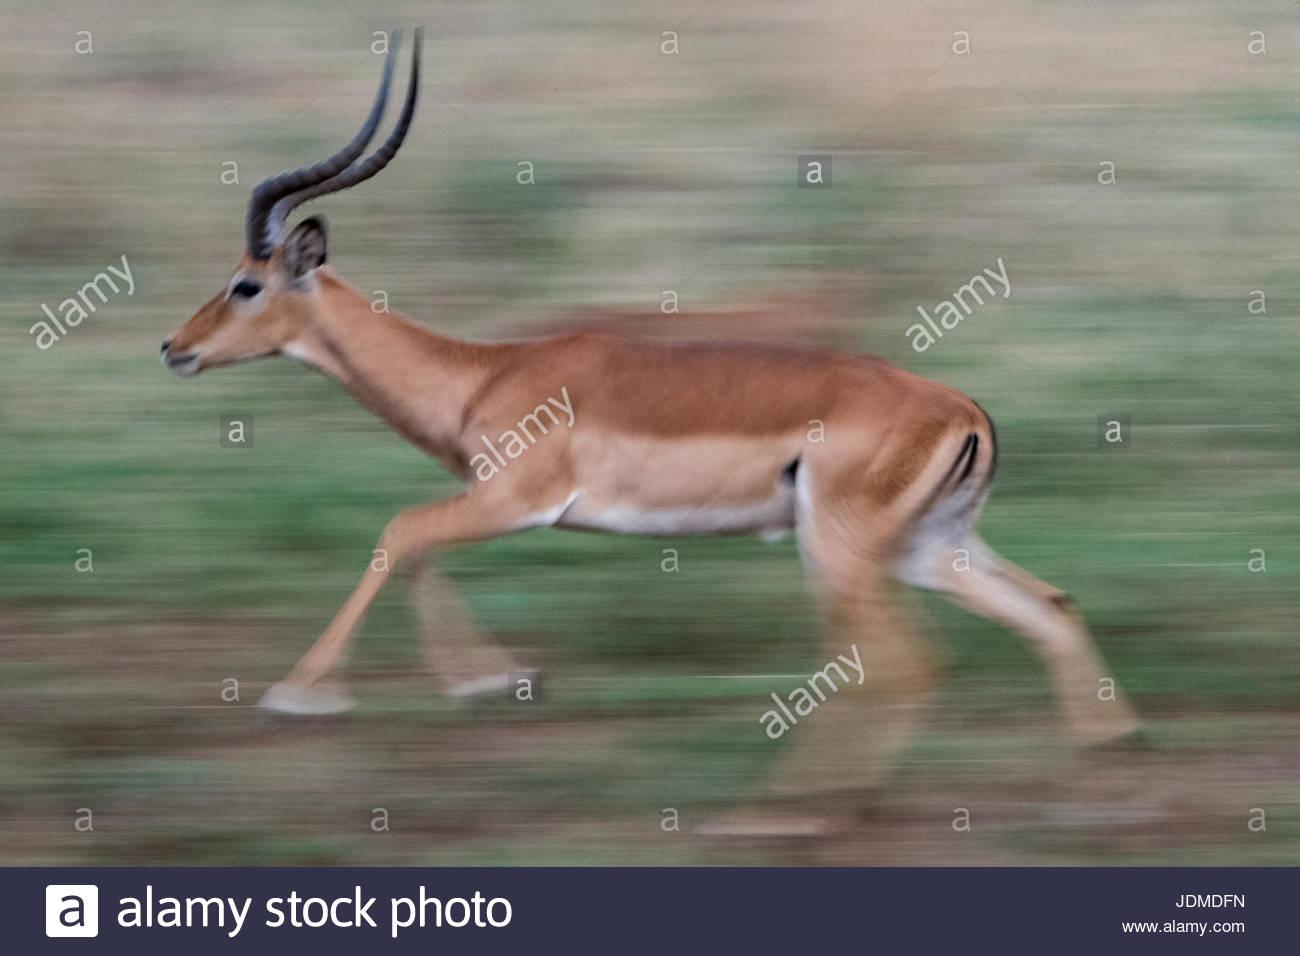 An impala running in Serengeti National Park. - Stock Image